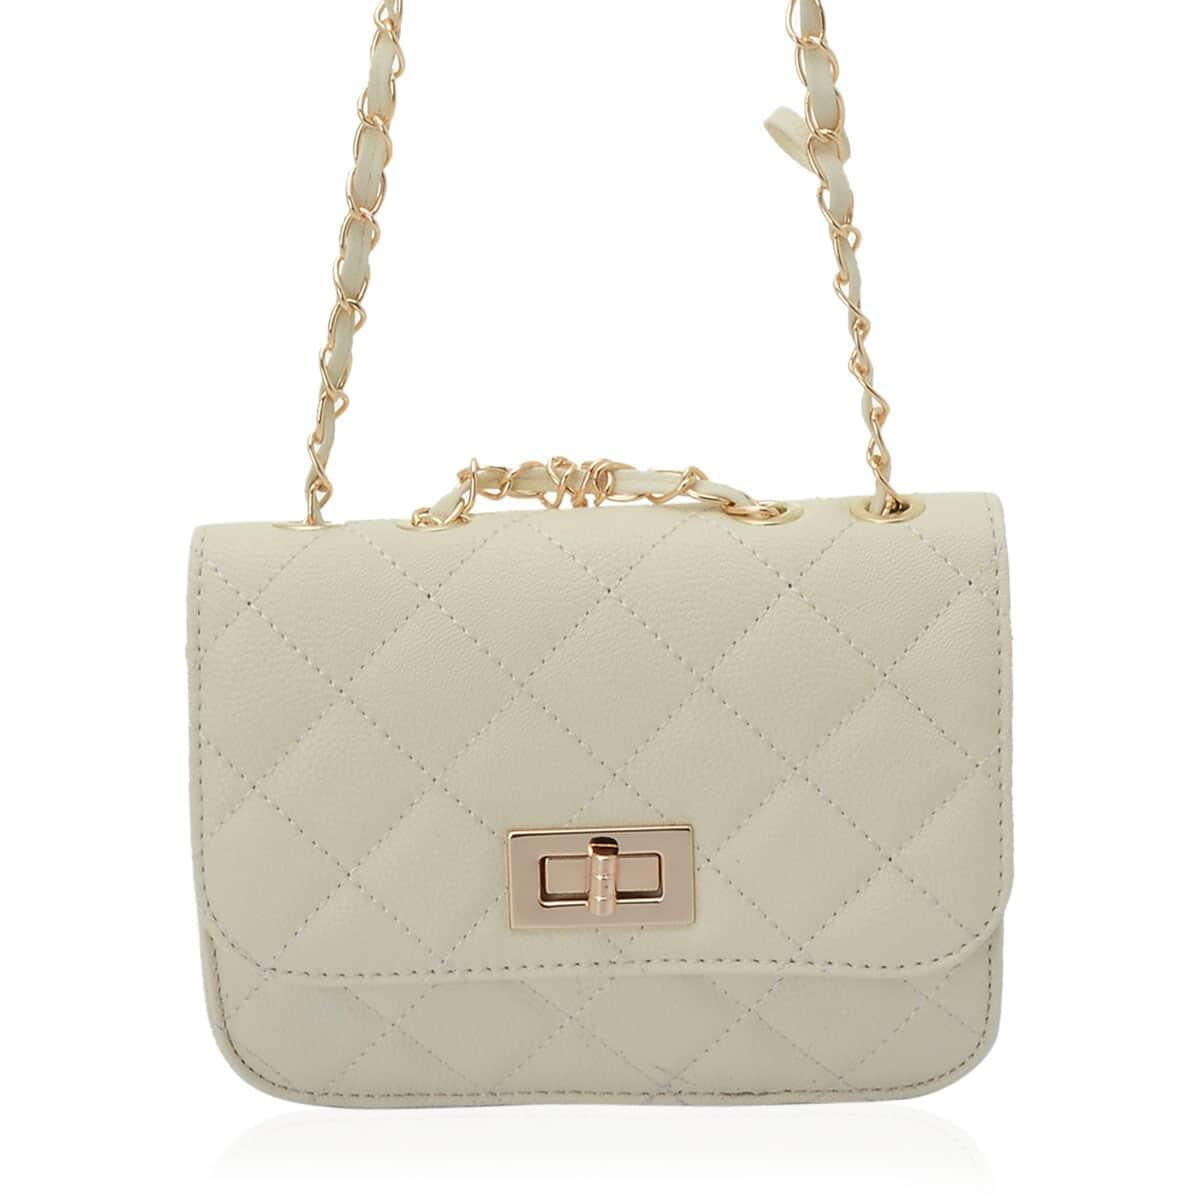 J Francis - Cream Faux Leather Crossbody Bag (7.5x2x5.5 in)